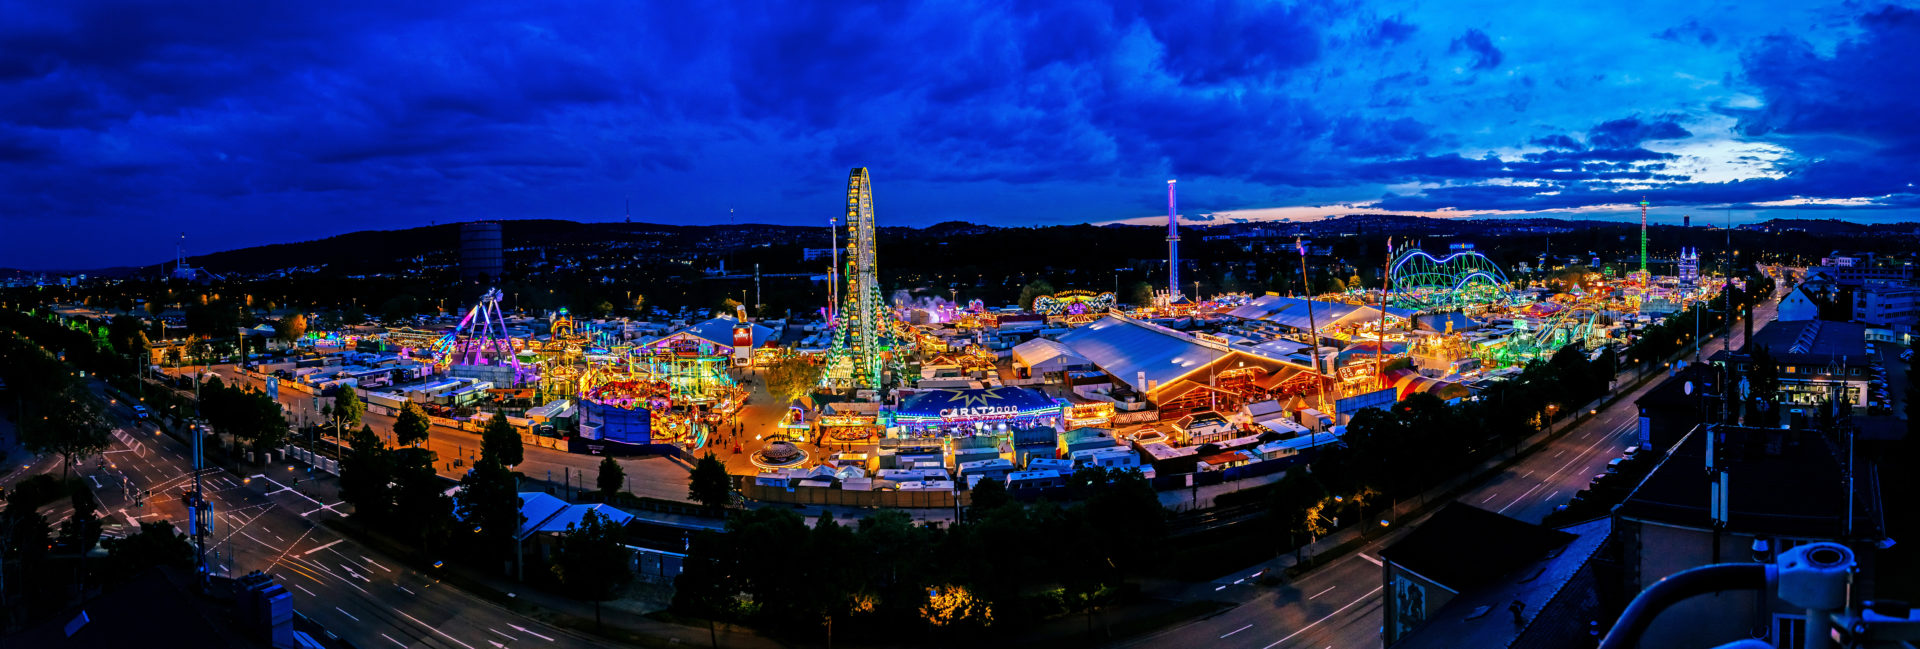 Fruehlingsfest Panorama